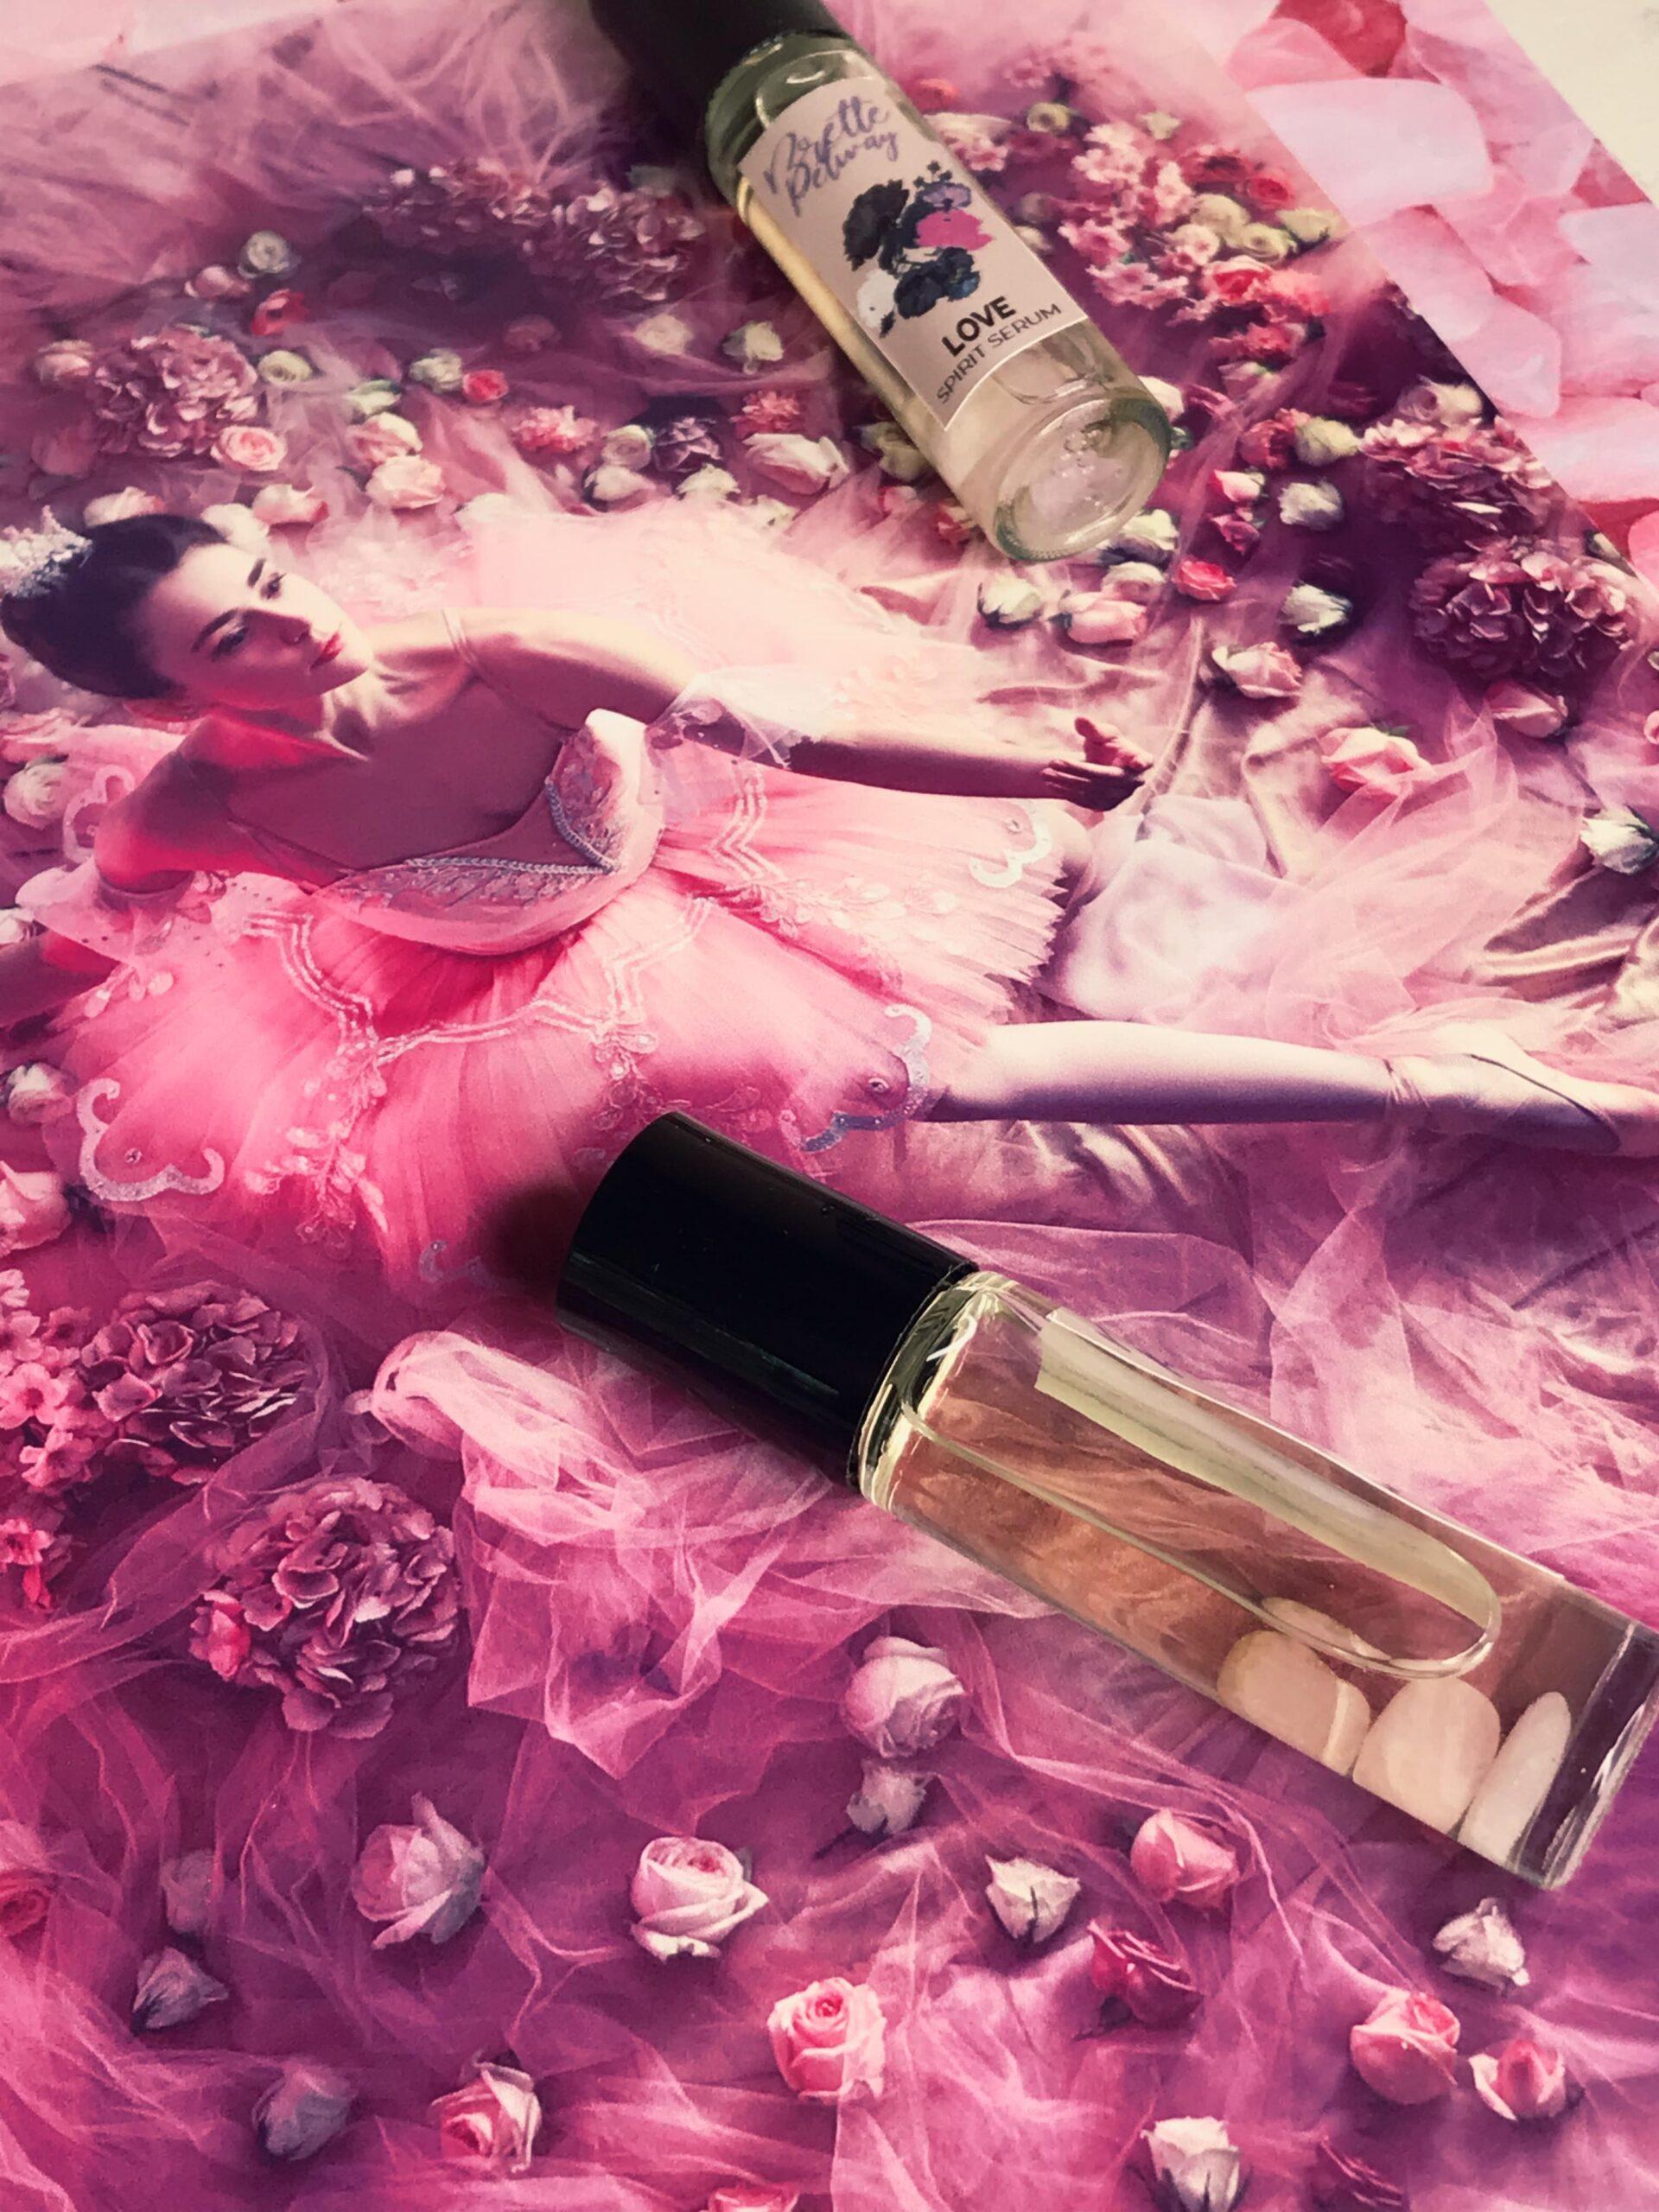 Aromatherapy_perfume_oil_Love_crystals_08.min